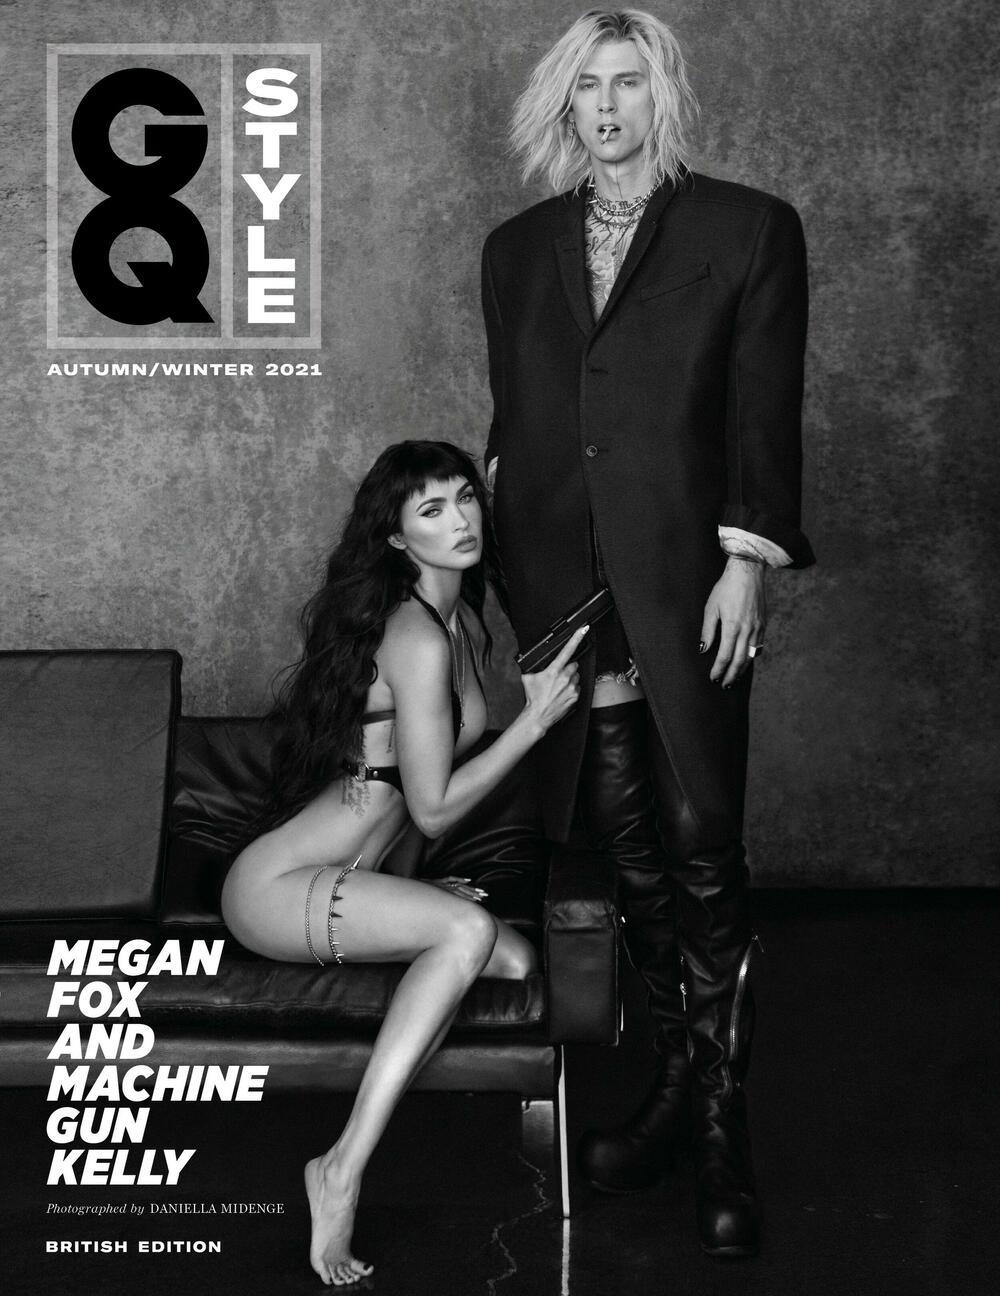 Megan Fox, Megan Foks, Mašin Gan Keli